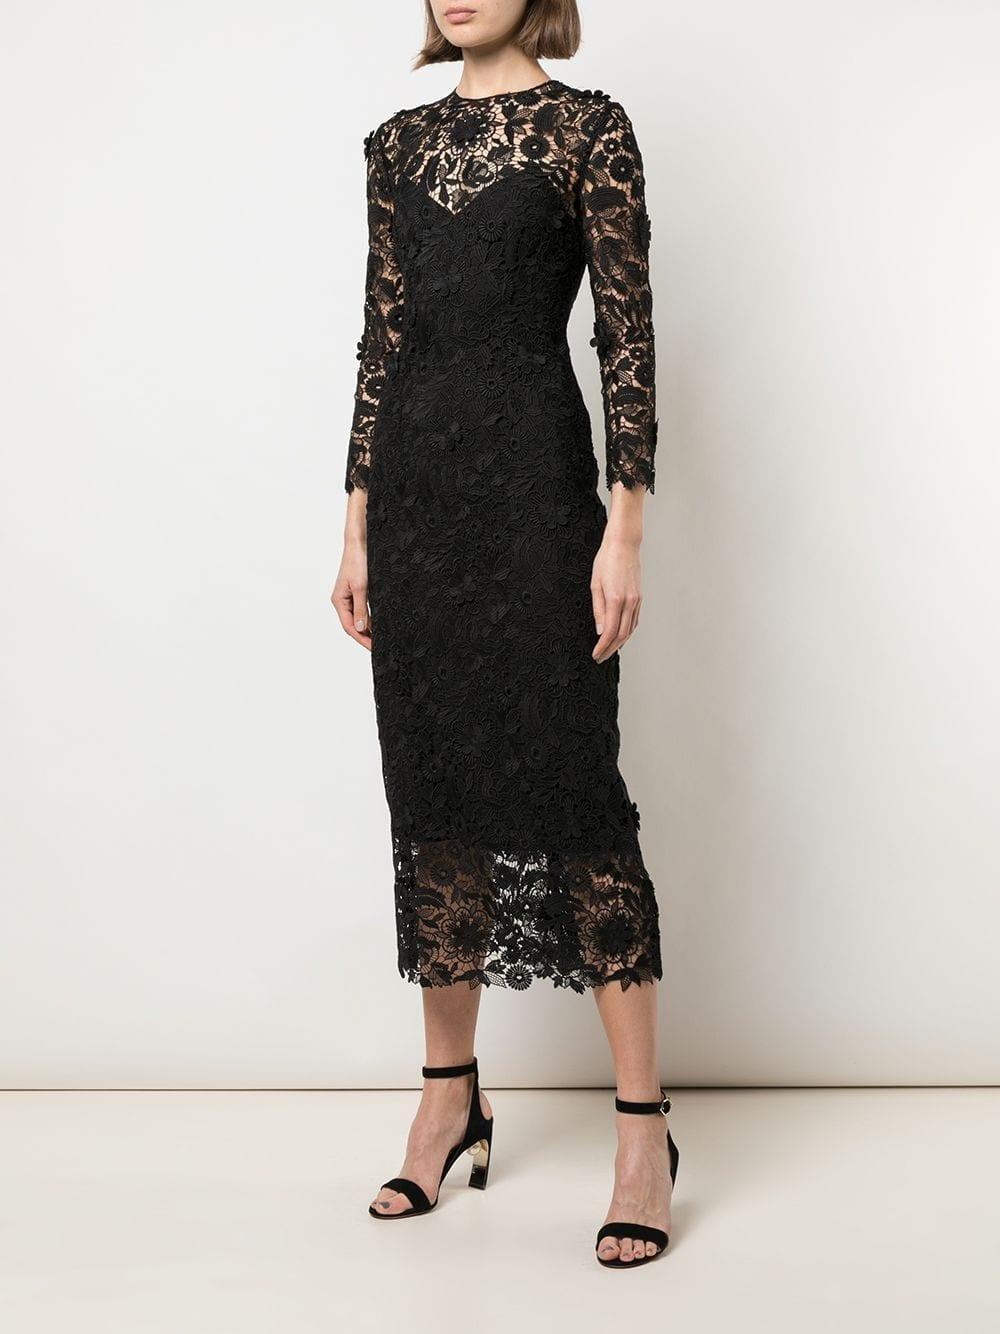 CAROLINA HERRERA Lace Midi Dress